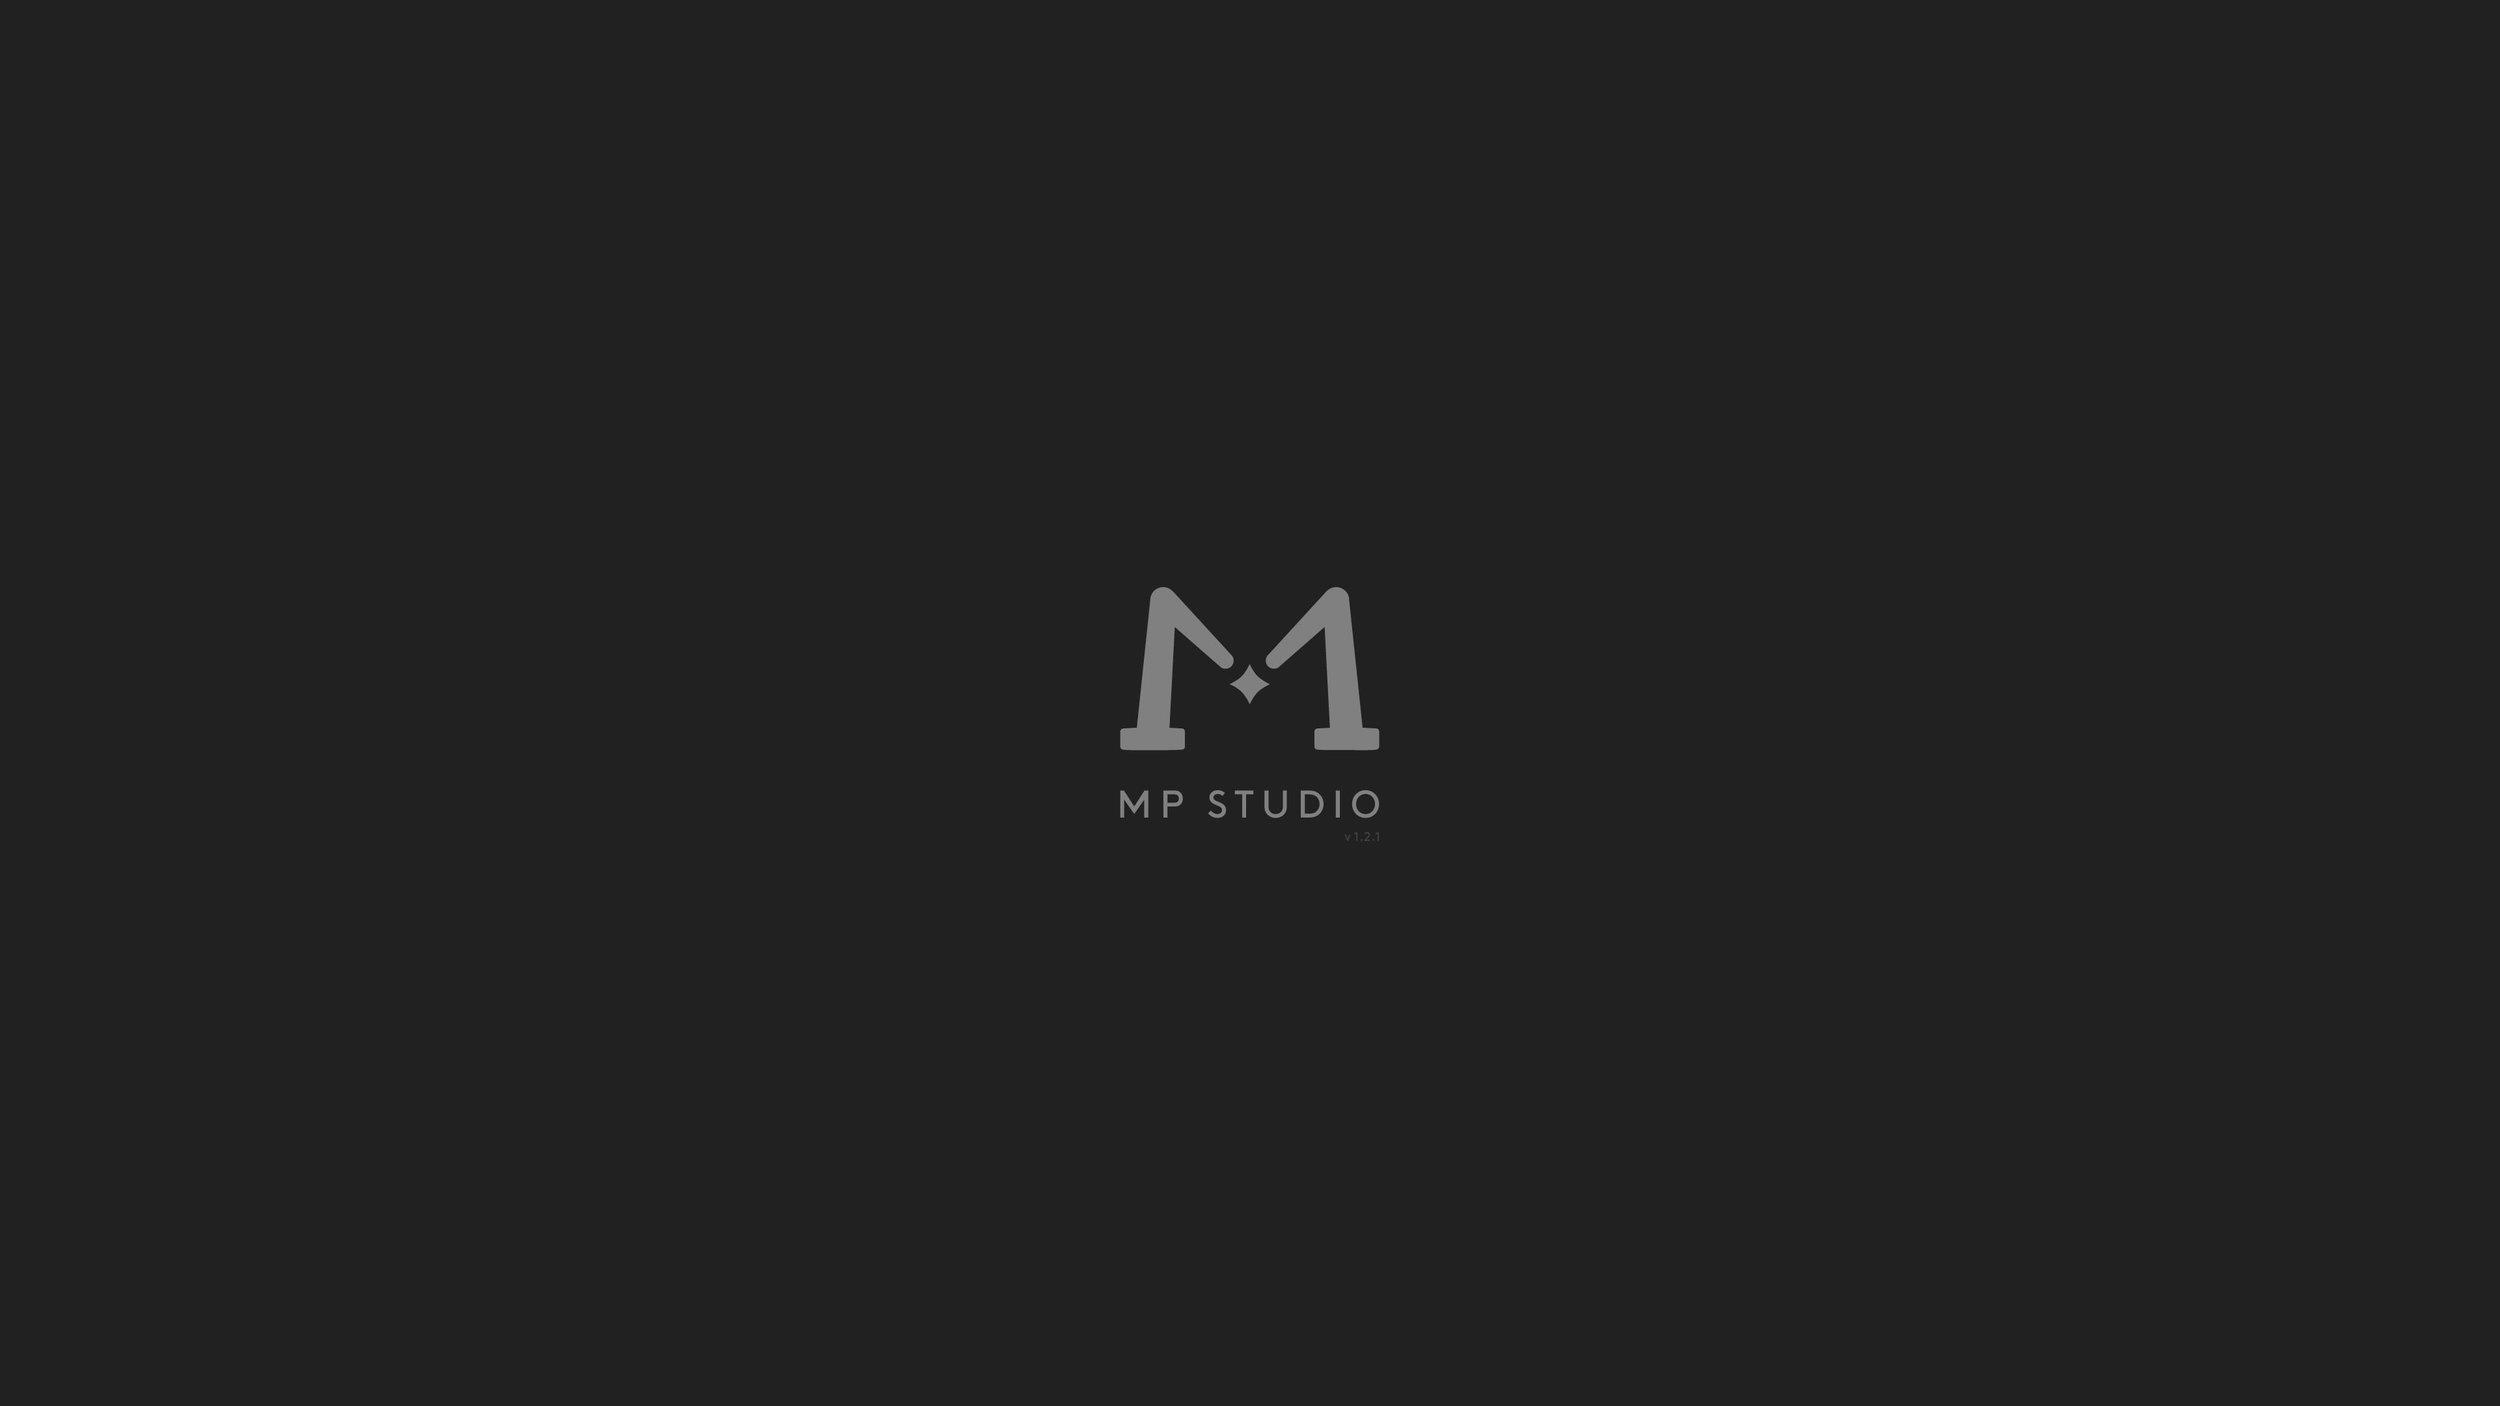 MPS_SPLASH_001.jpg